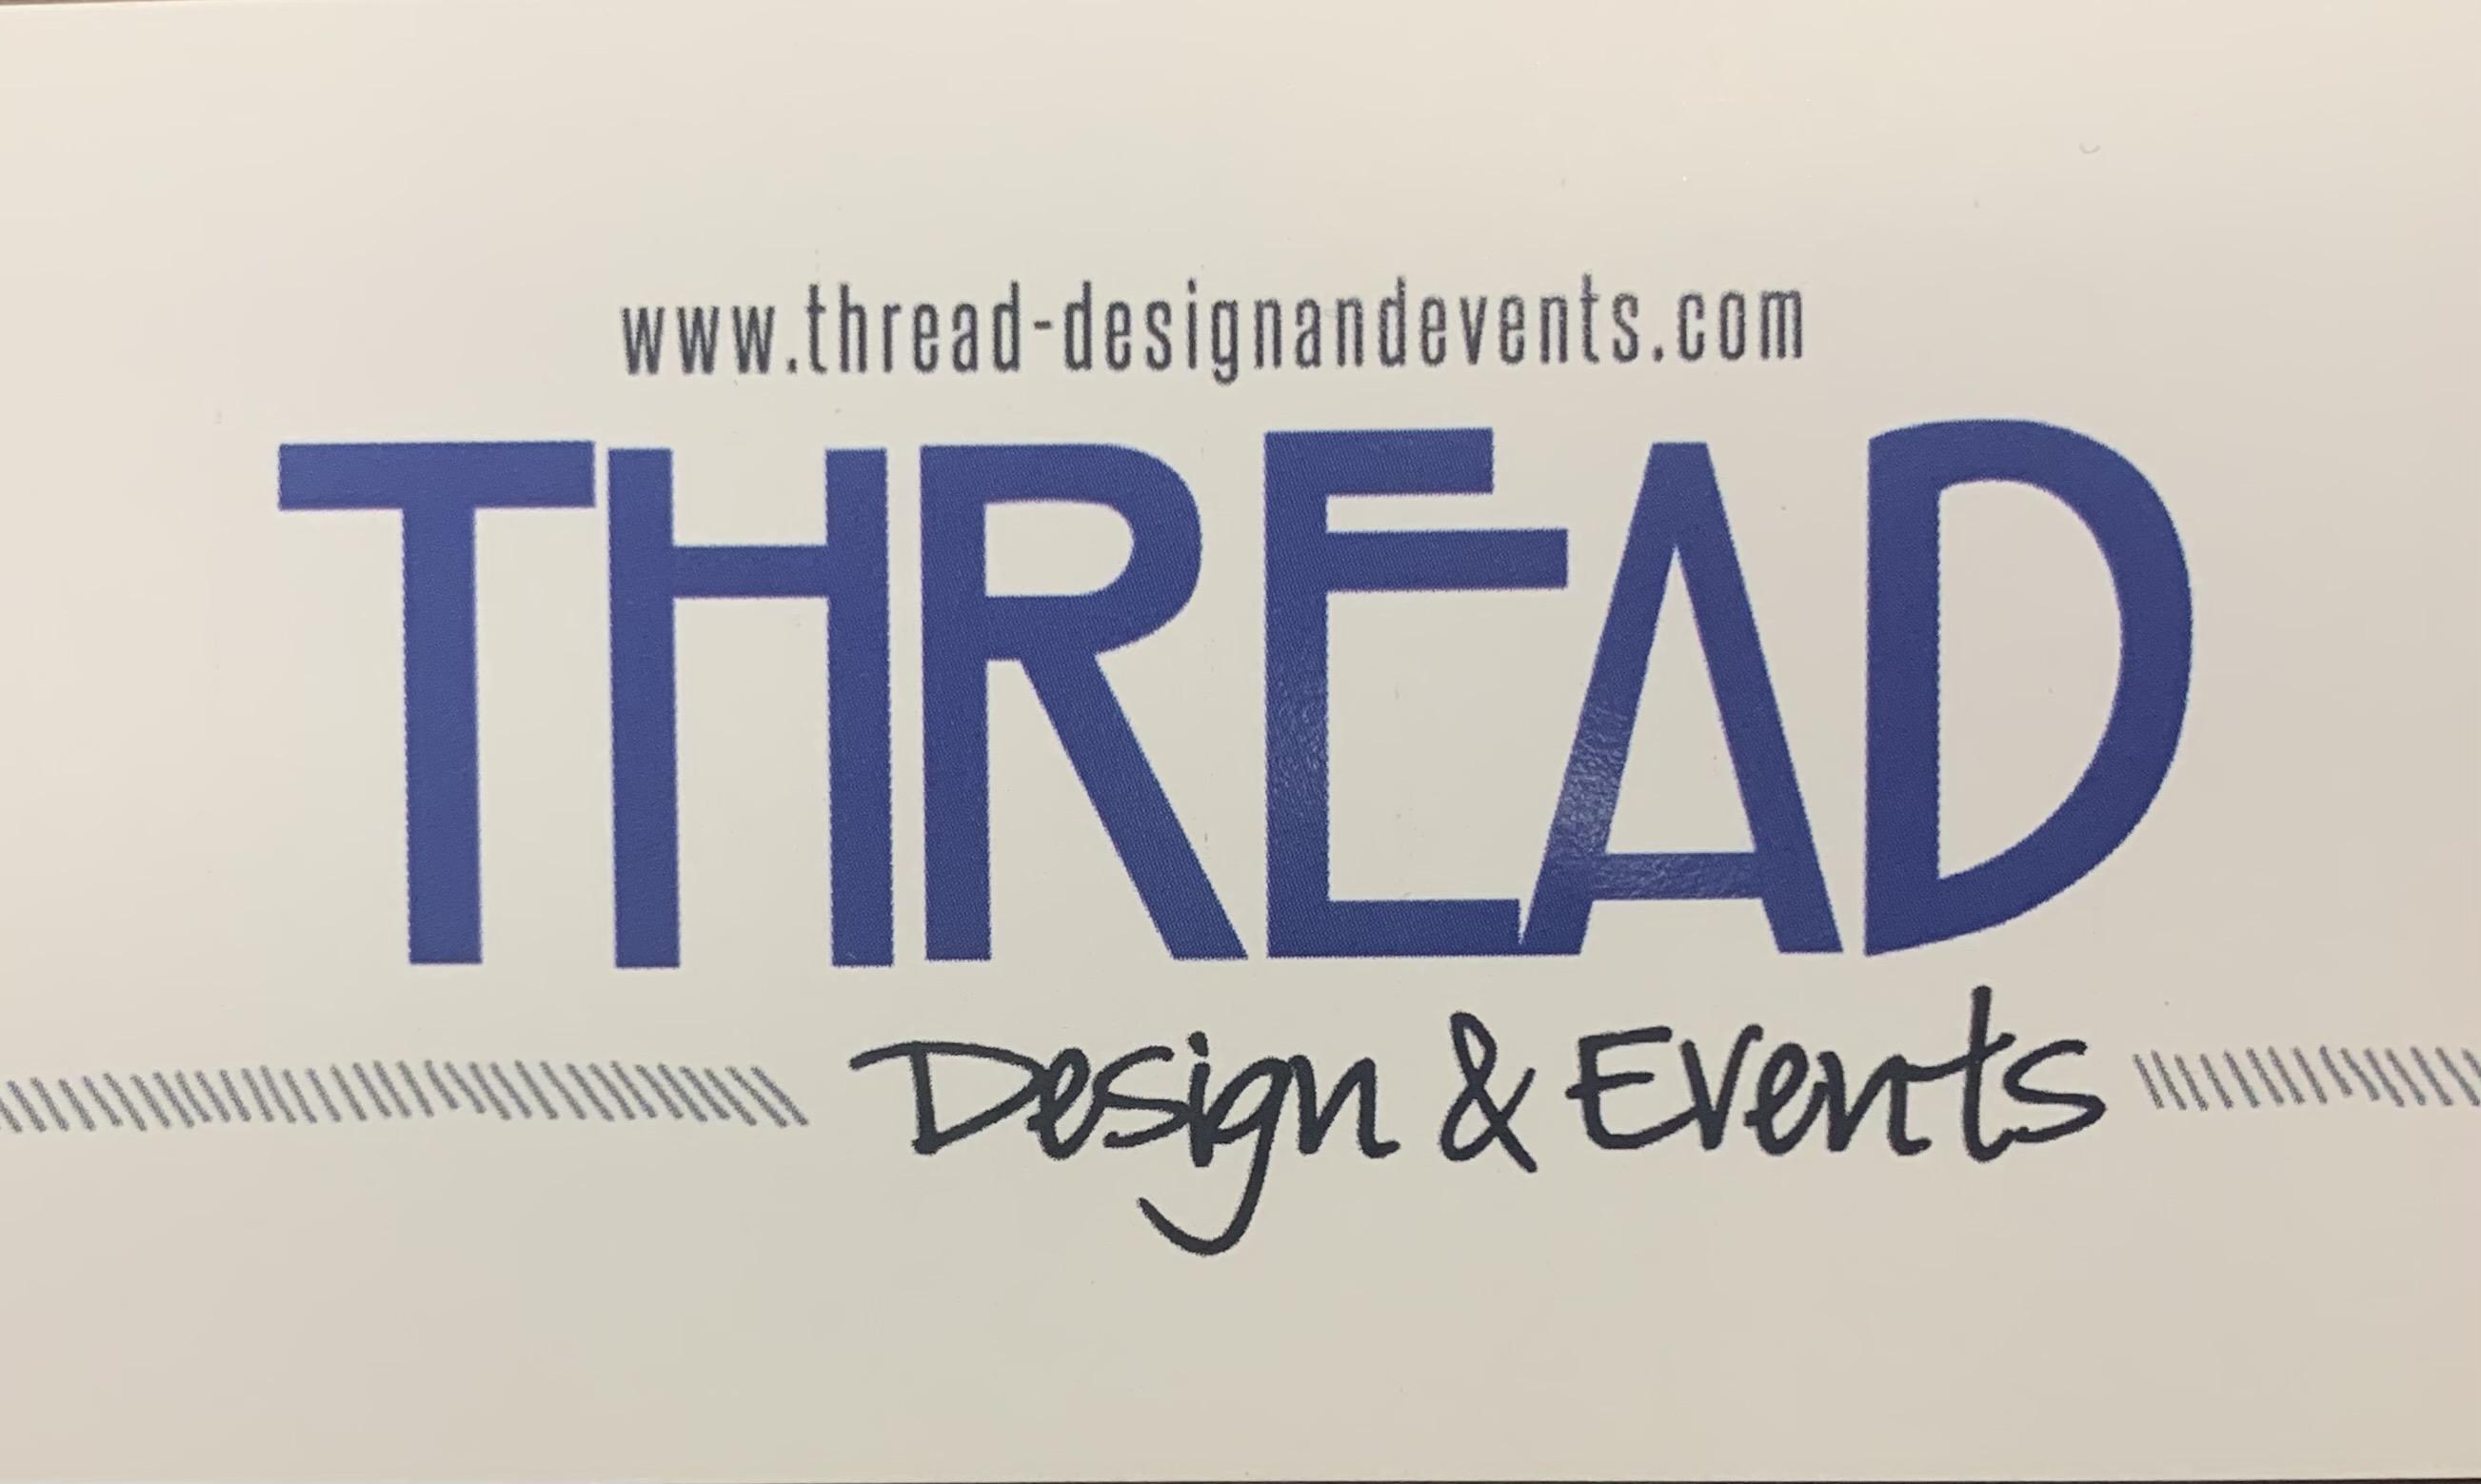 Thread Design & Events